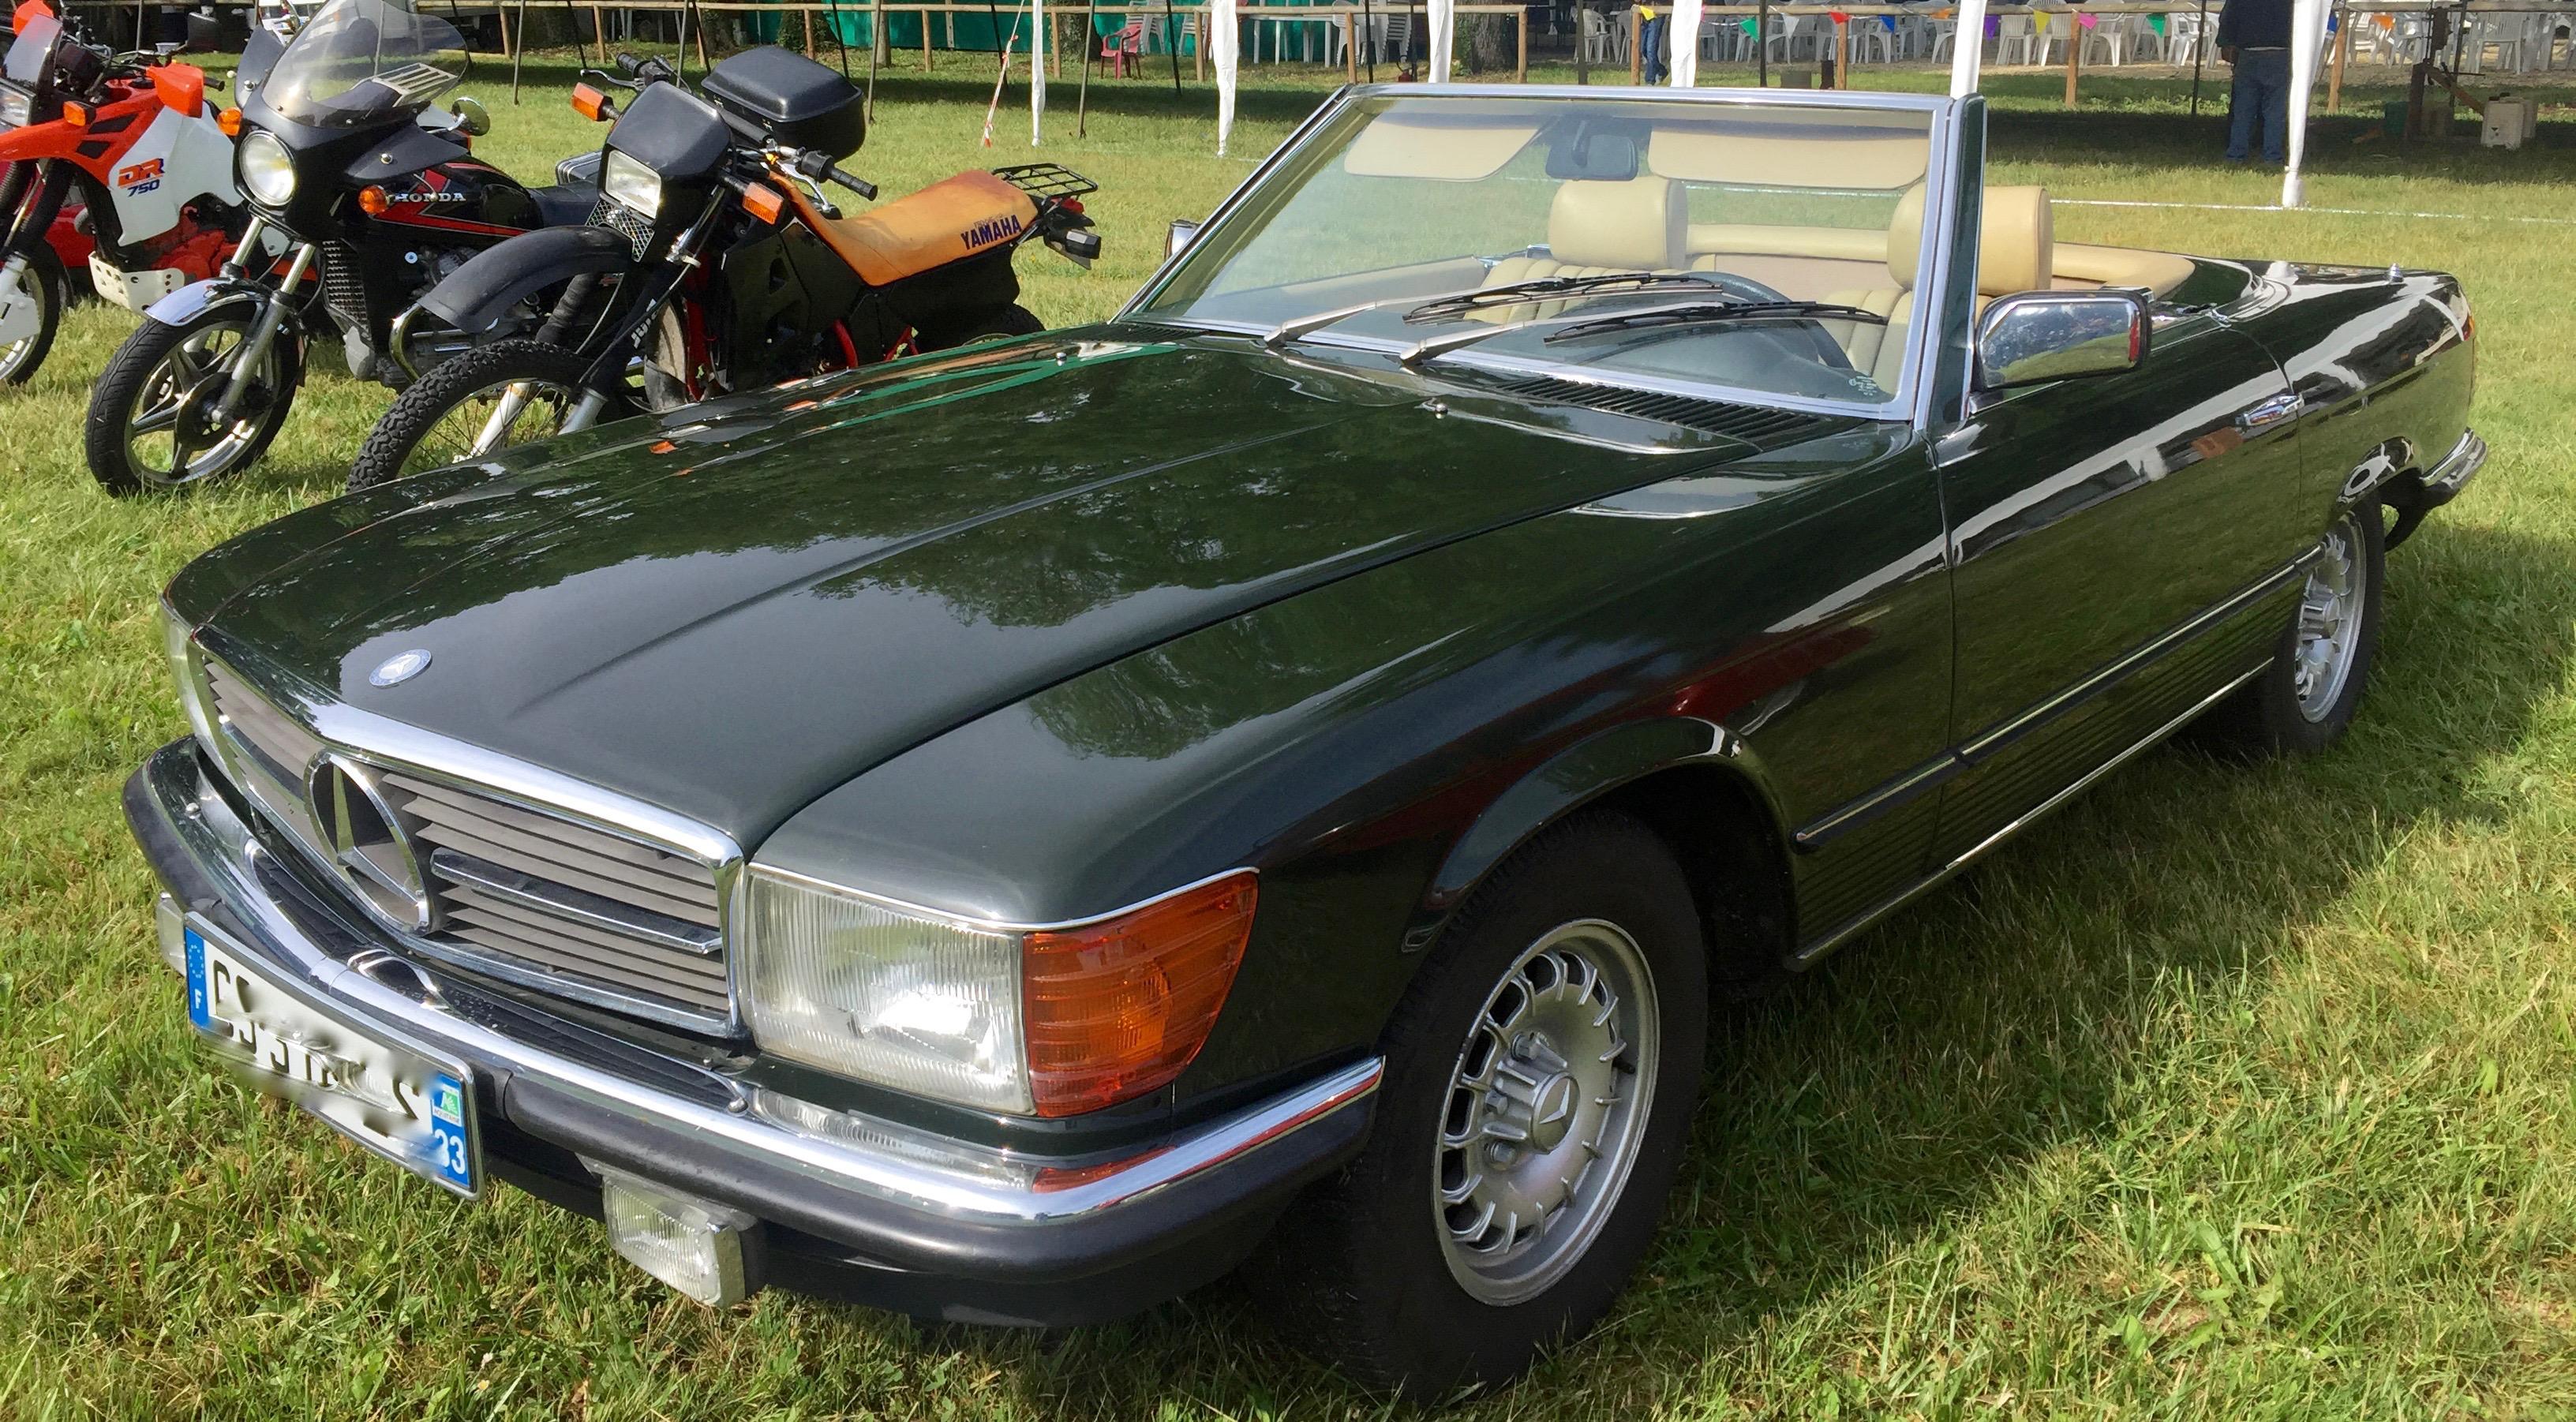 MERCEDES 290 SL - 1984